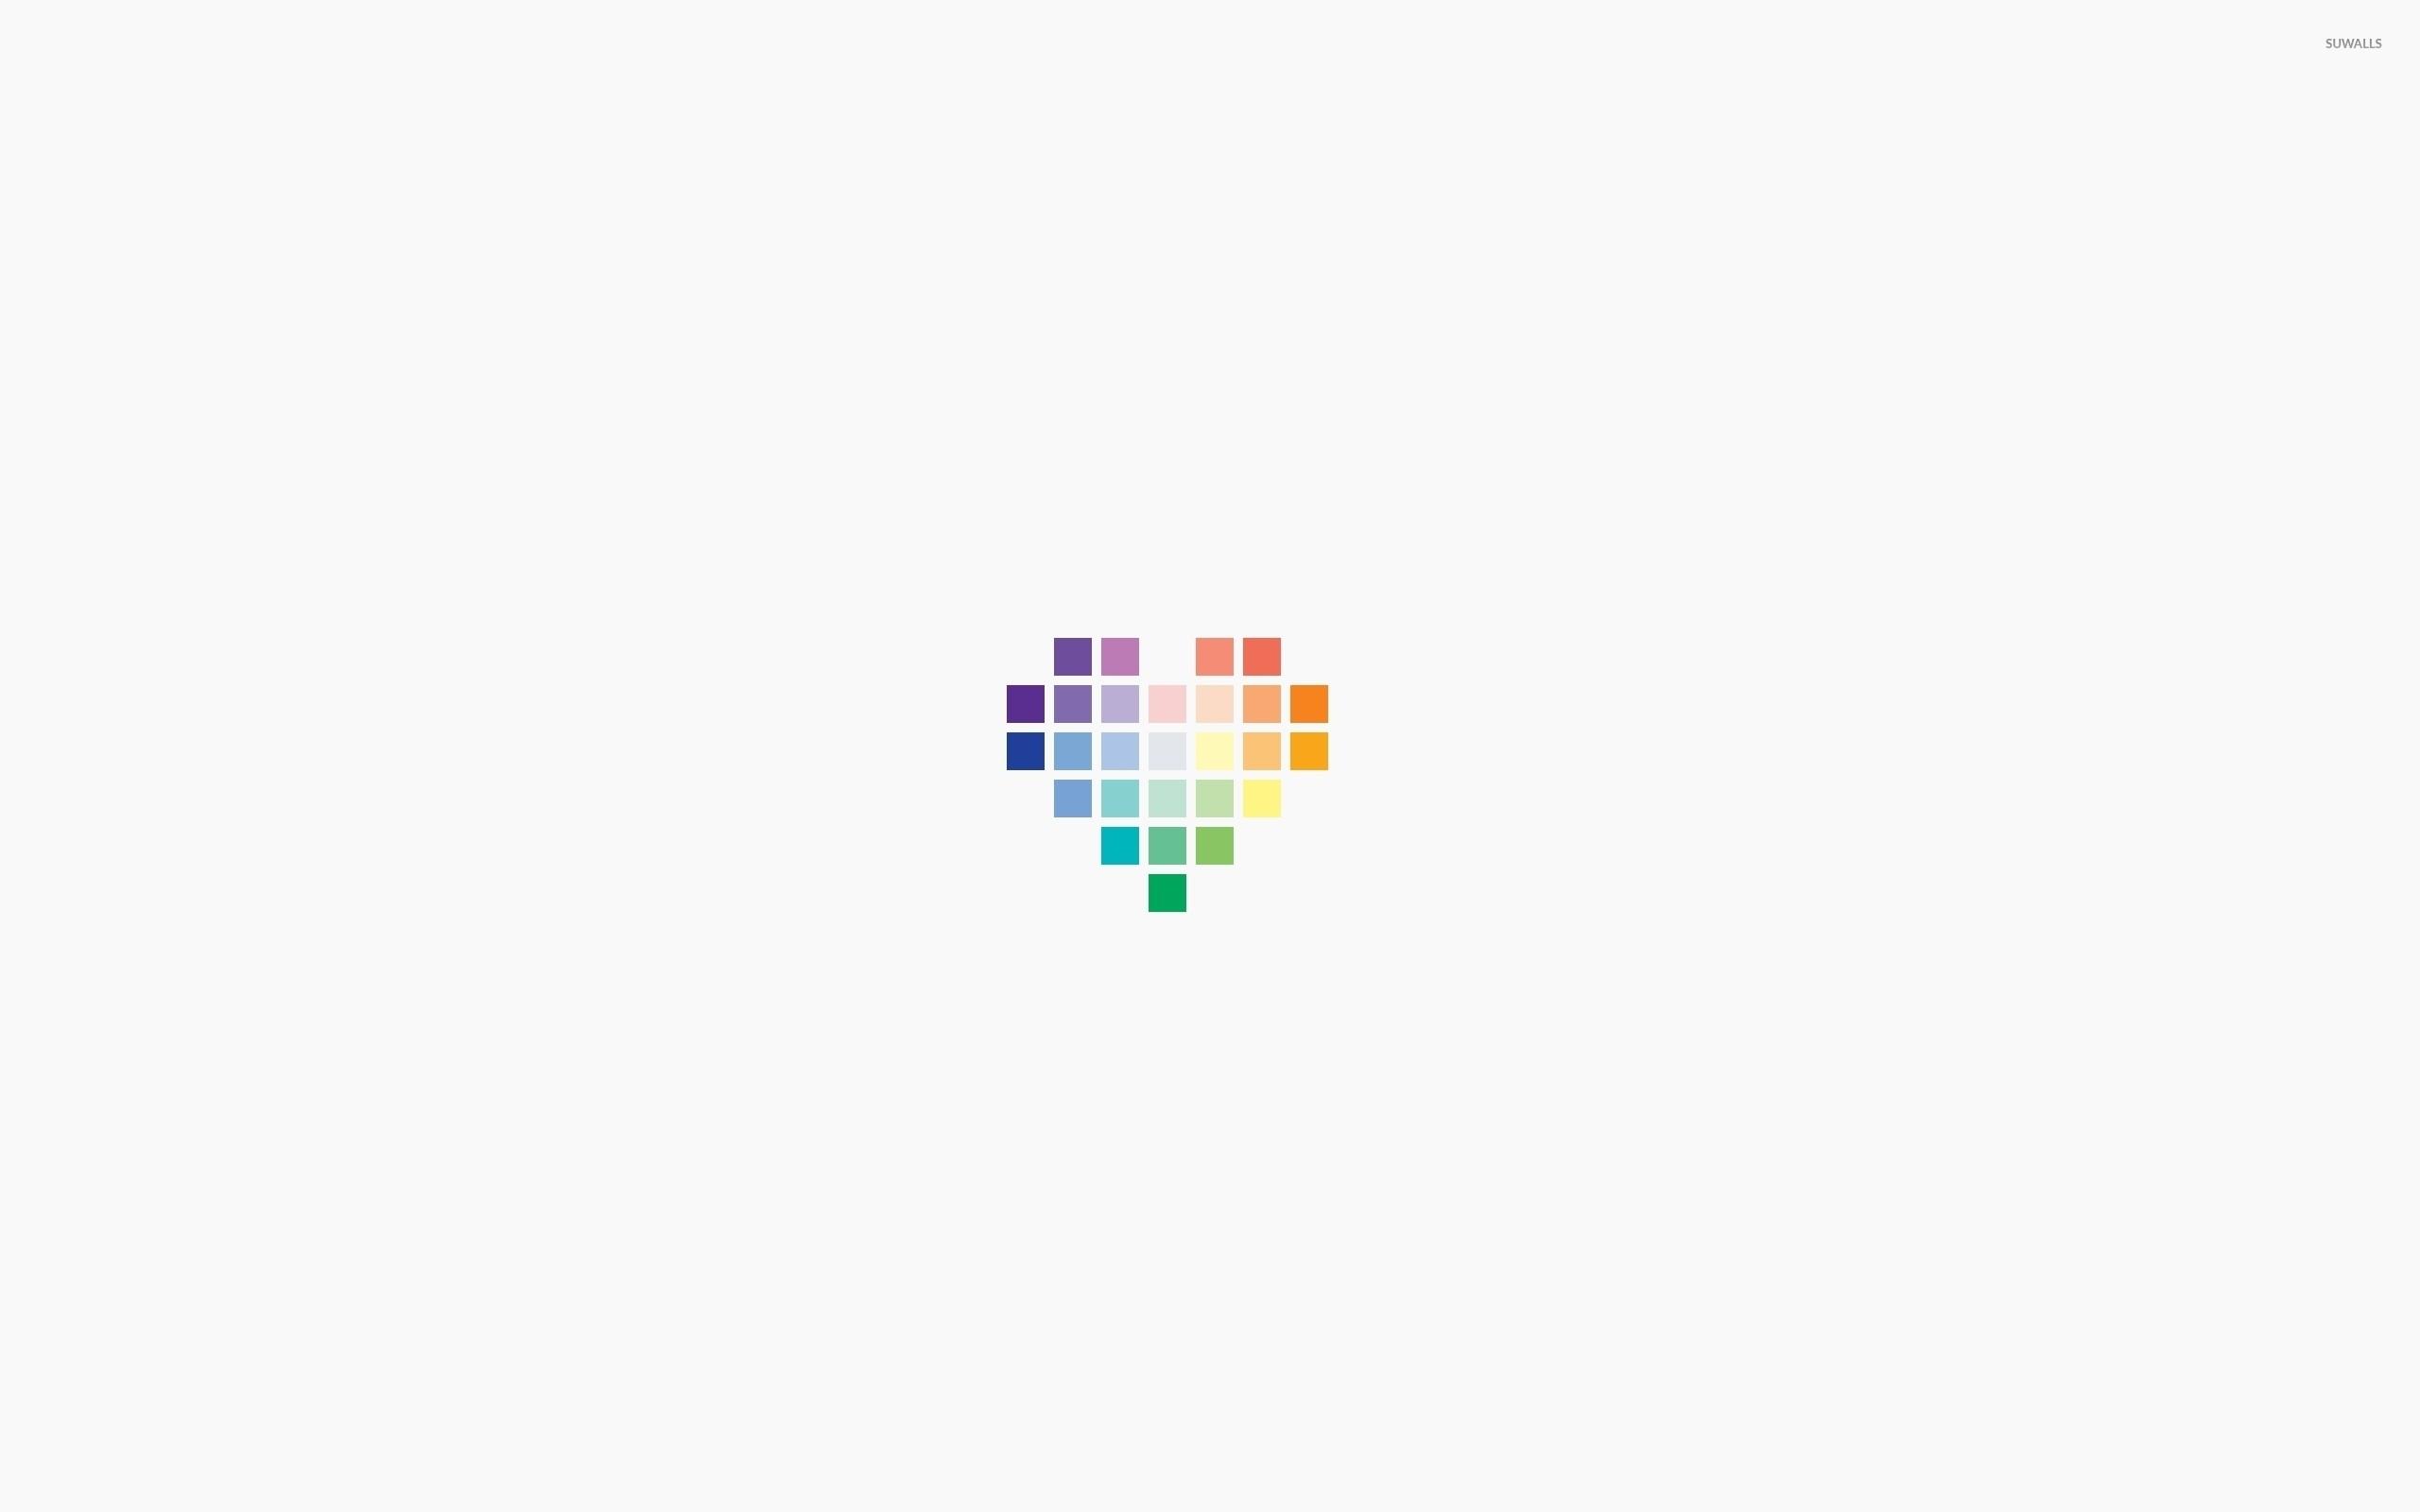 Squared heart wallpaper – Minimalistic wallpapers – #44547